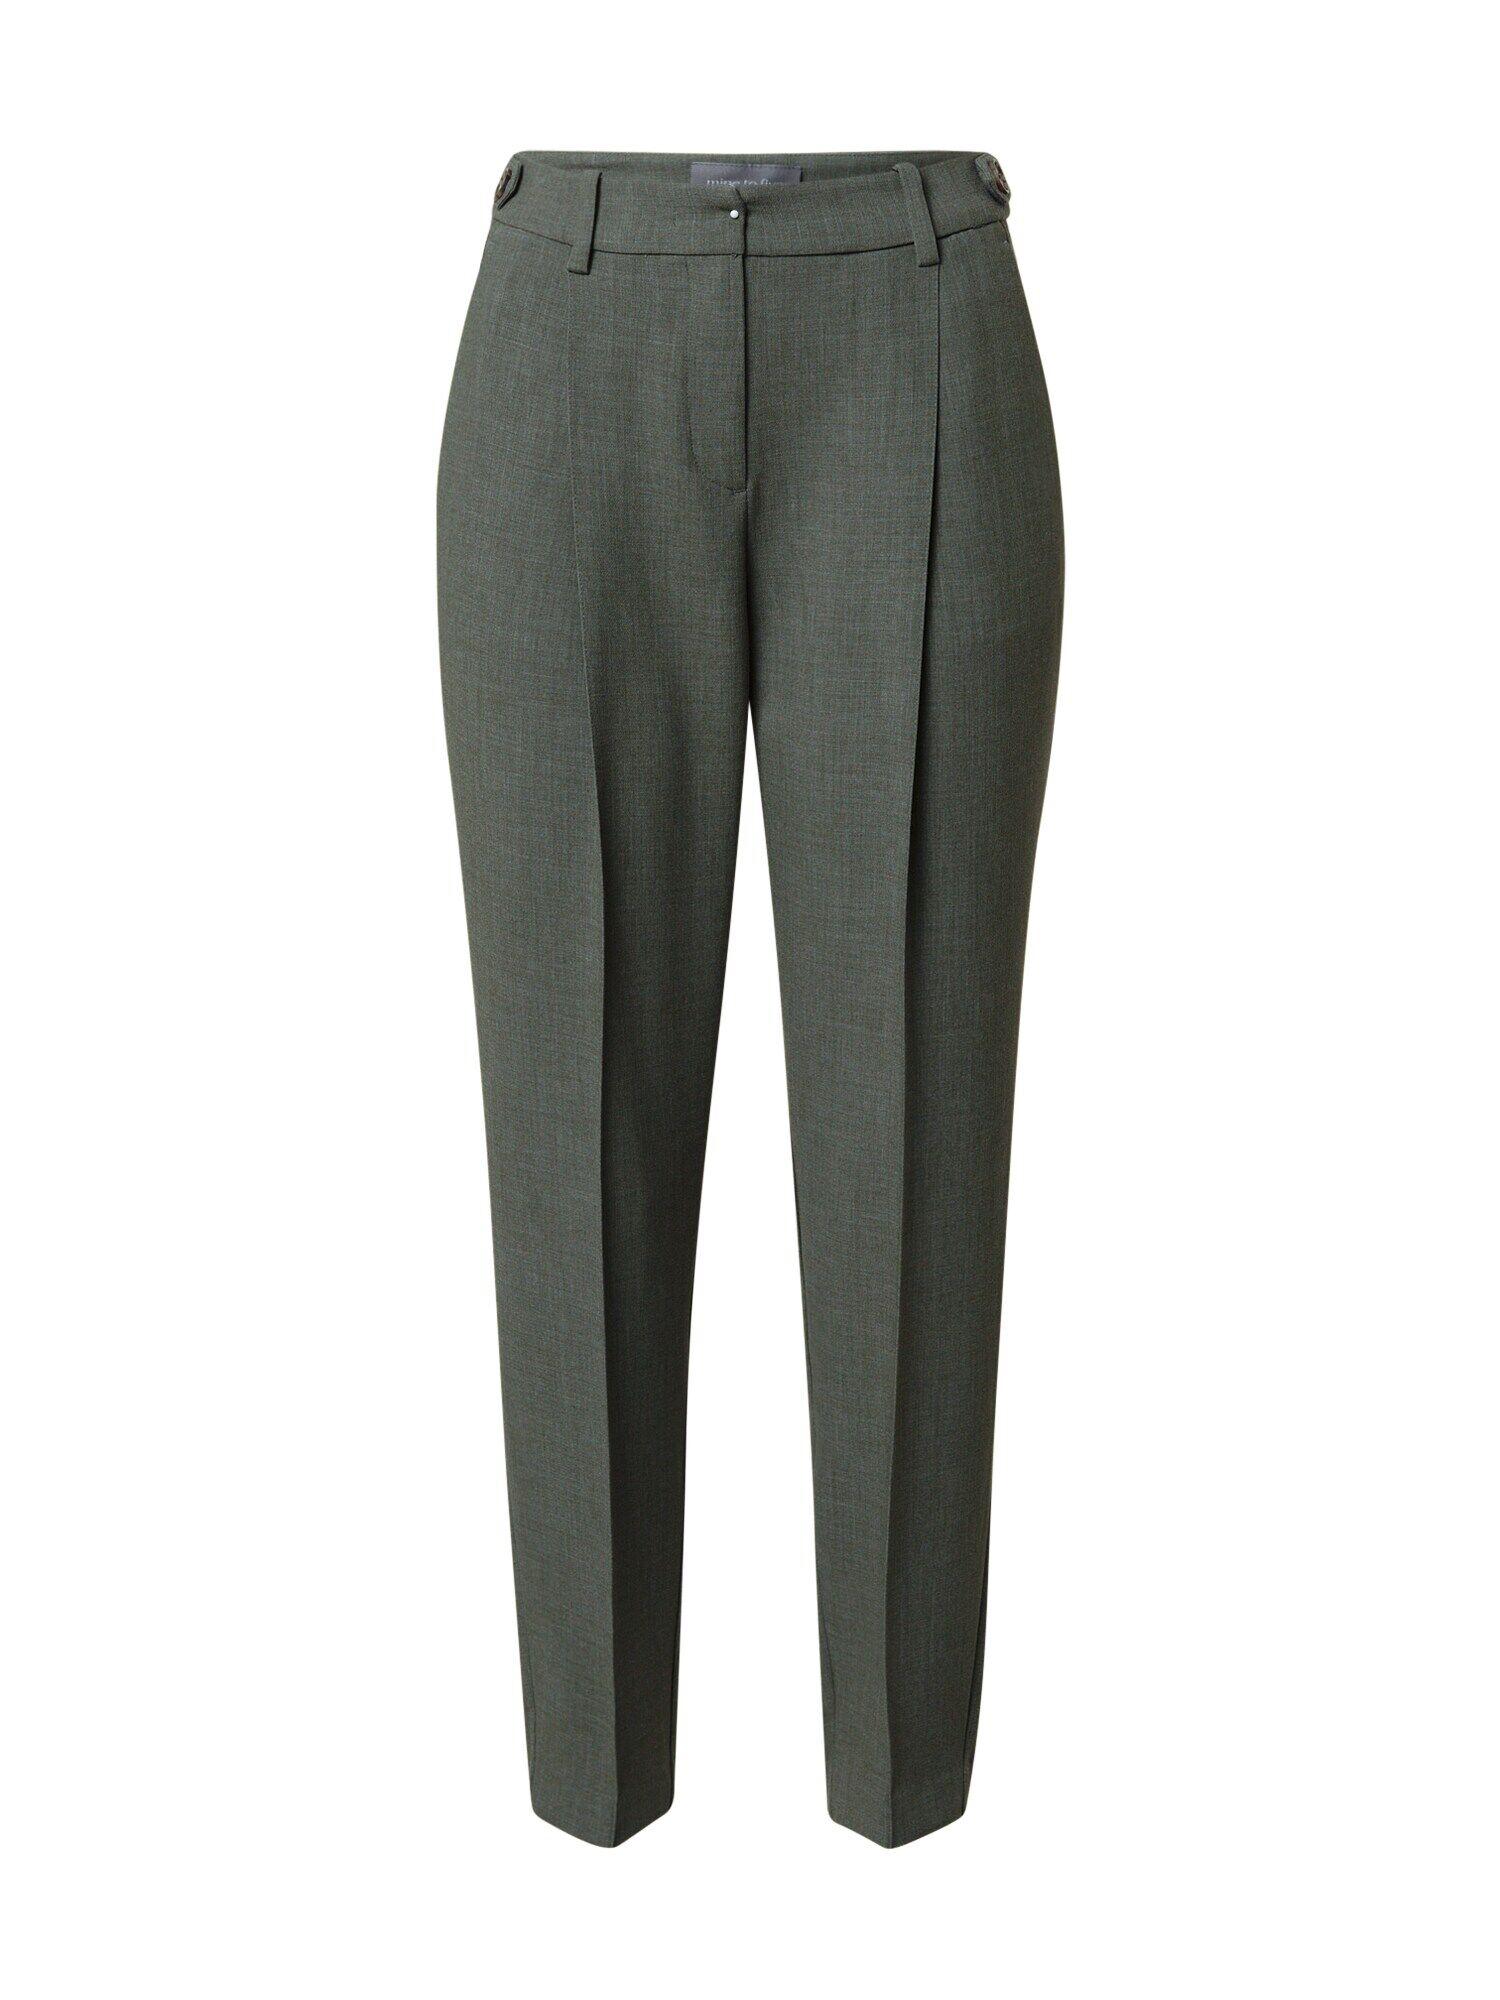 MINE TO FIVE Pantalon à pince  - Vert - Taille: 42 - female